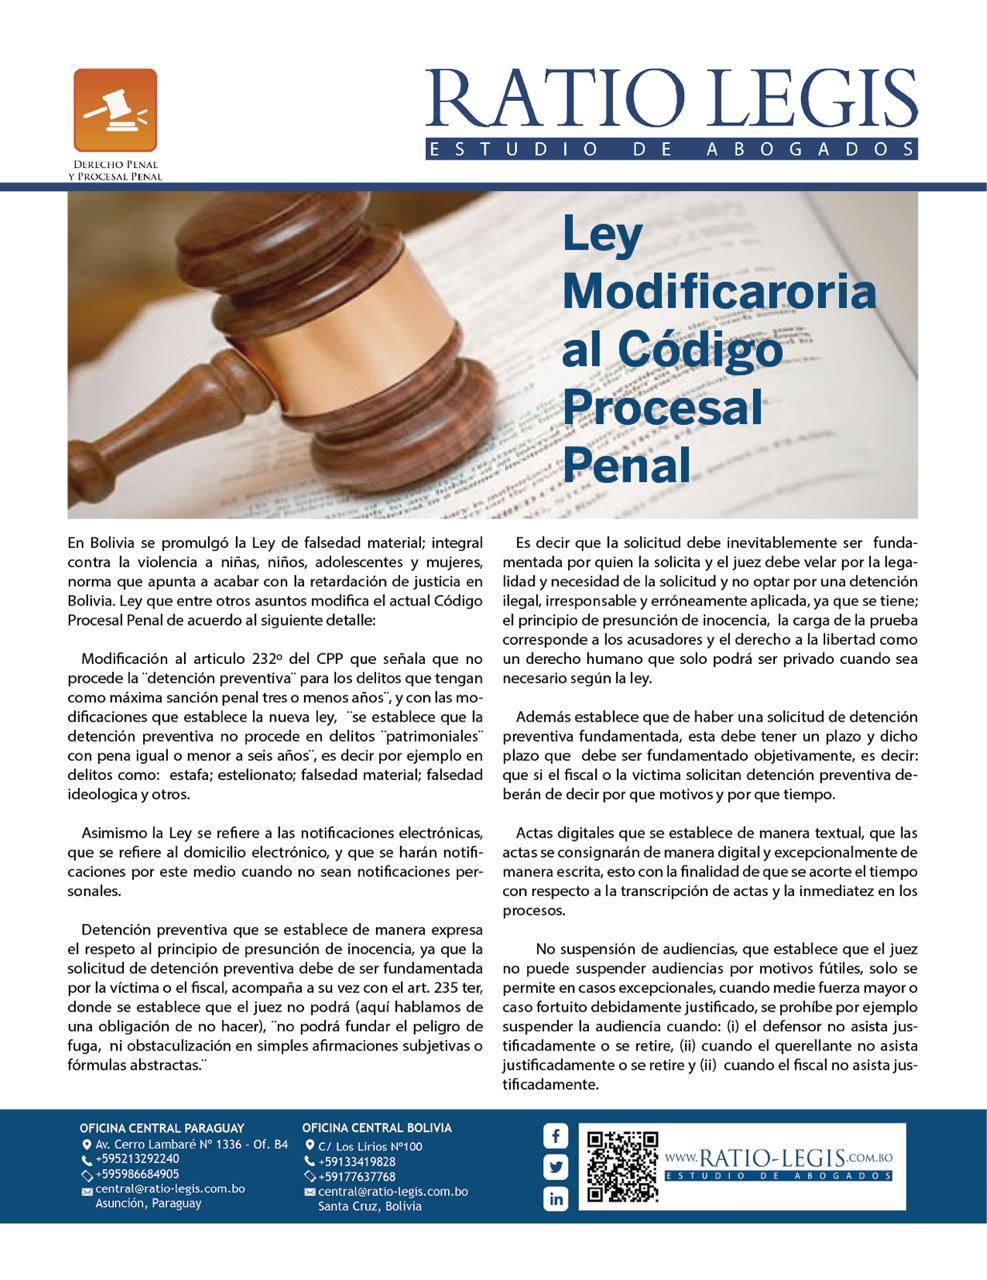 Ley Modificatoria al Código Procesal Penal